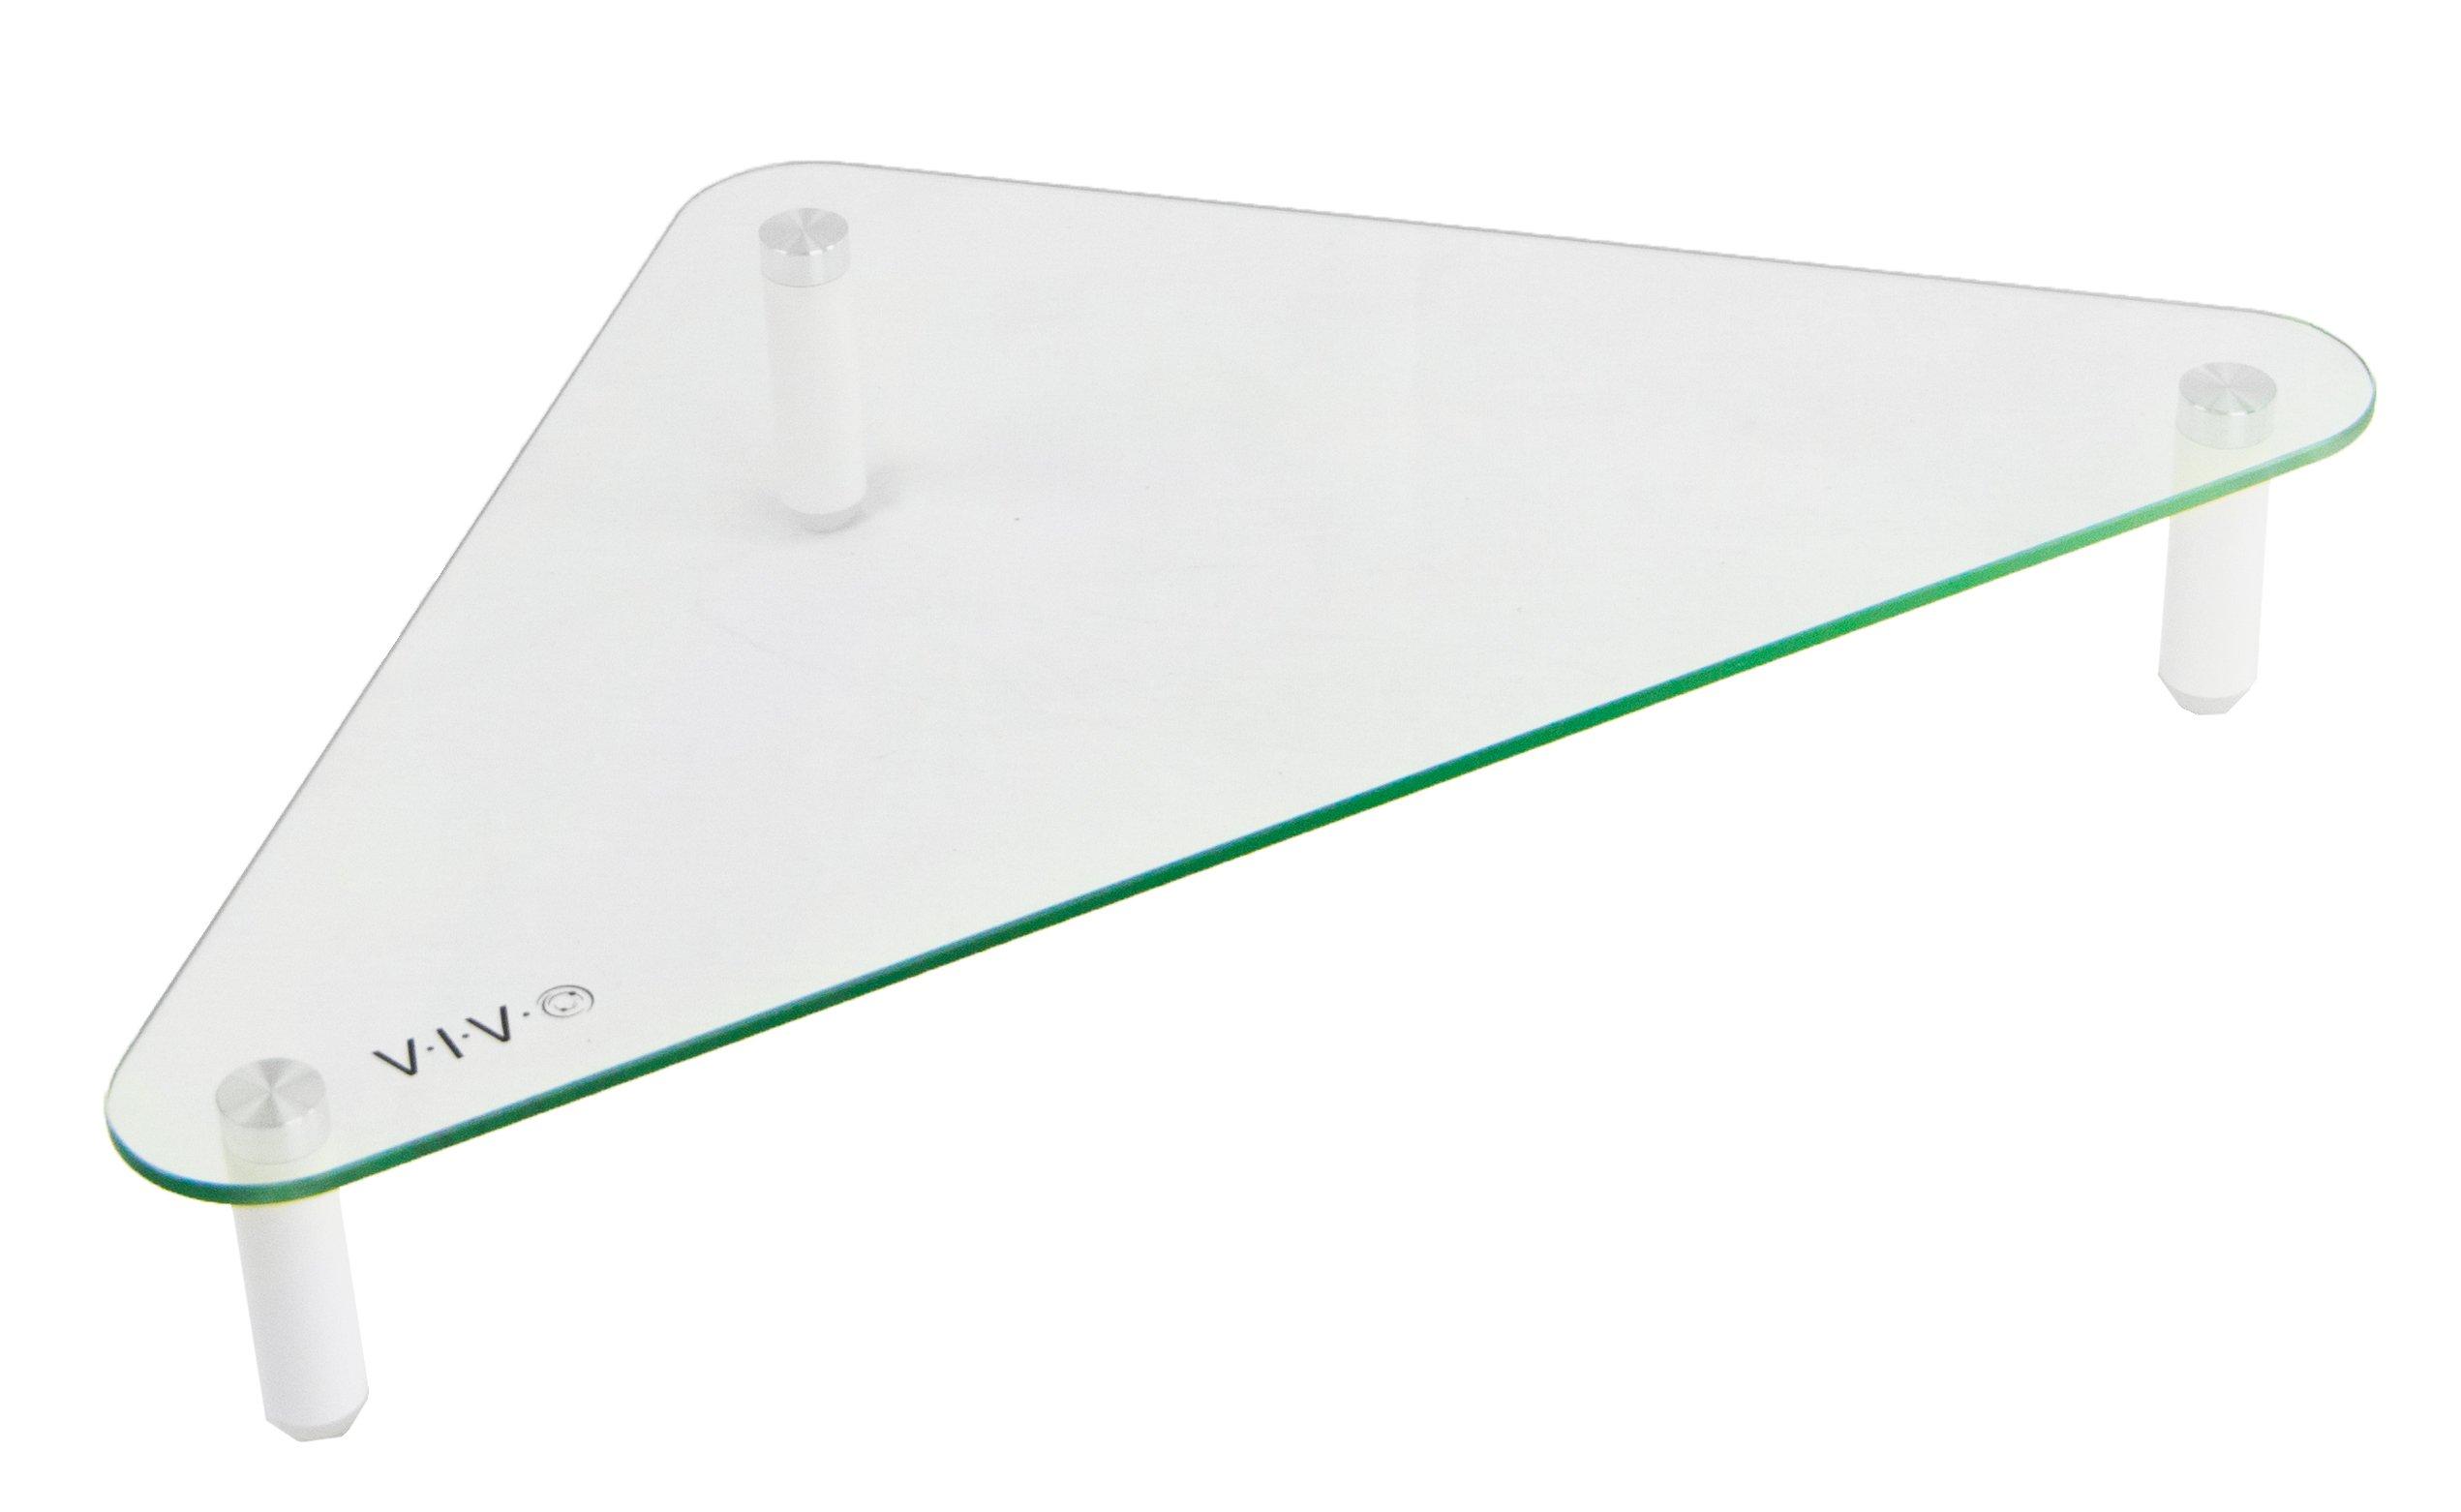 VIVO Glass Ergonomic Tabletop Riser | Triangle Desktop Universal Corner Stand for Computer Monitor & Laptop (STAND-V000Q) by VIVO (Image #1)